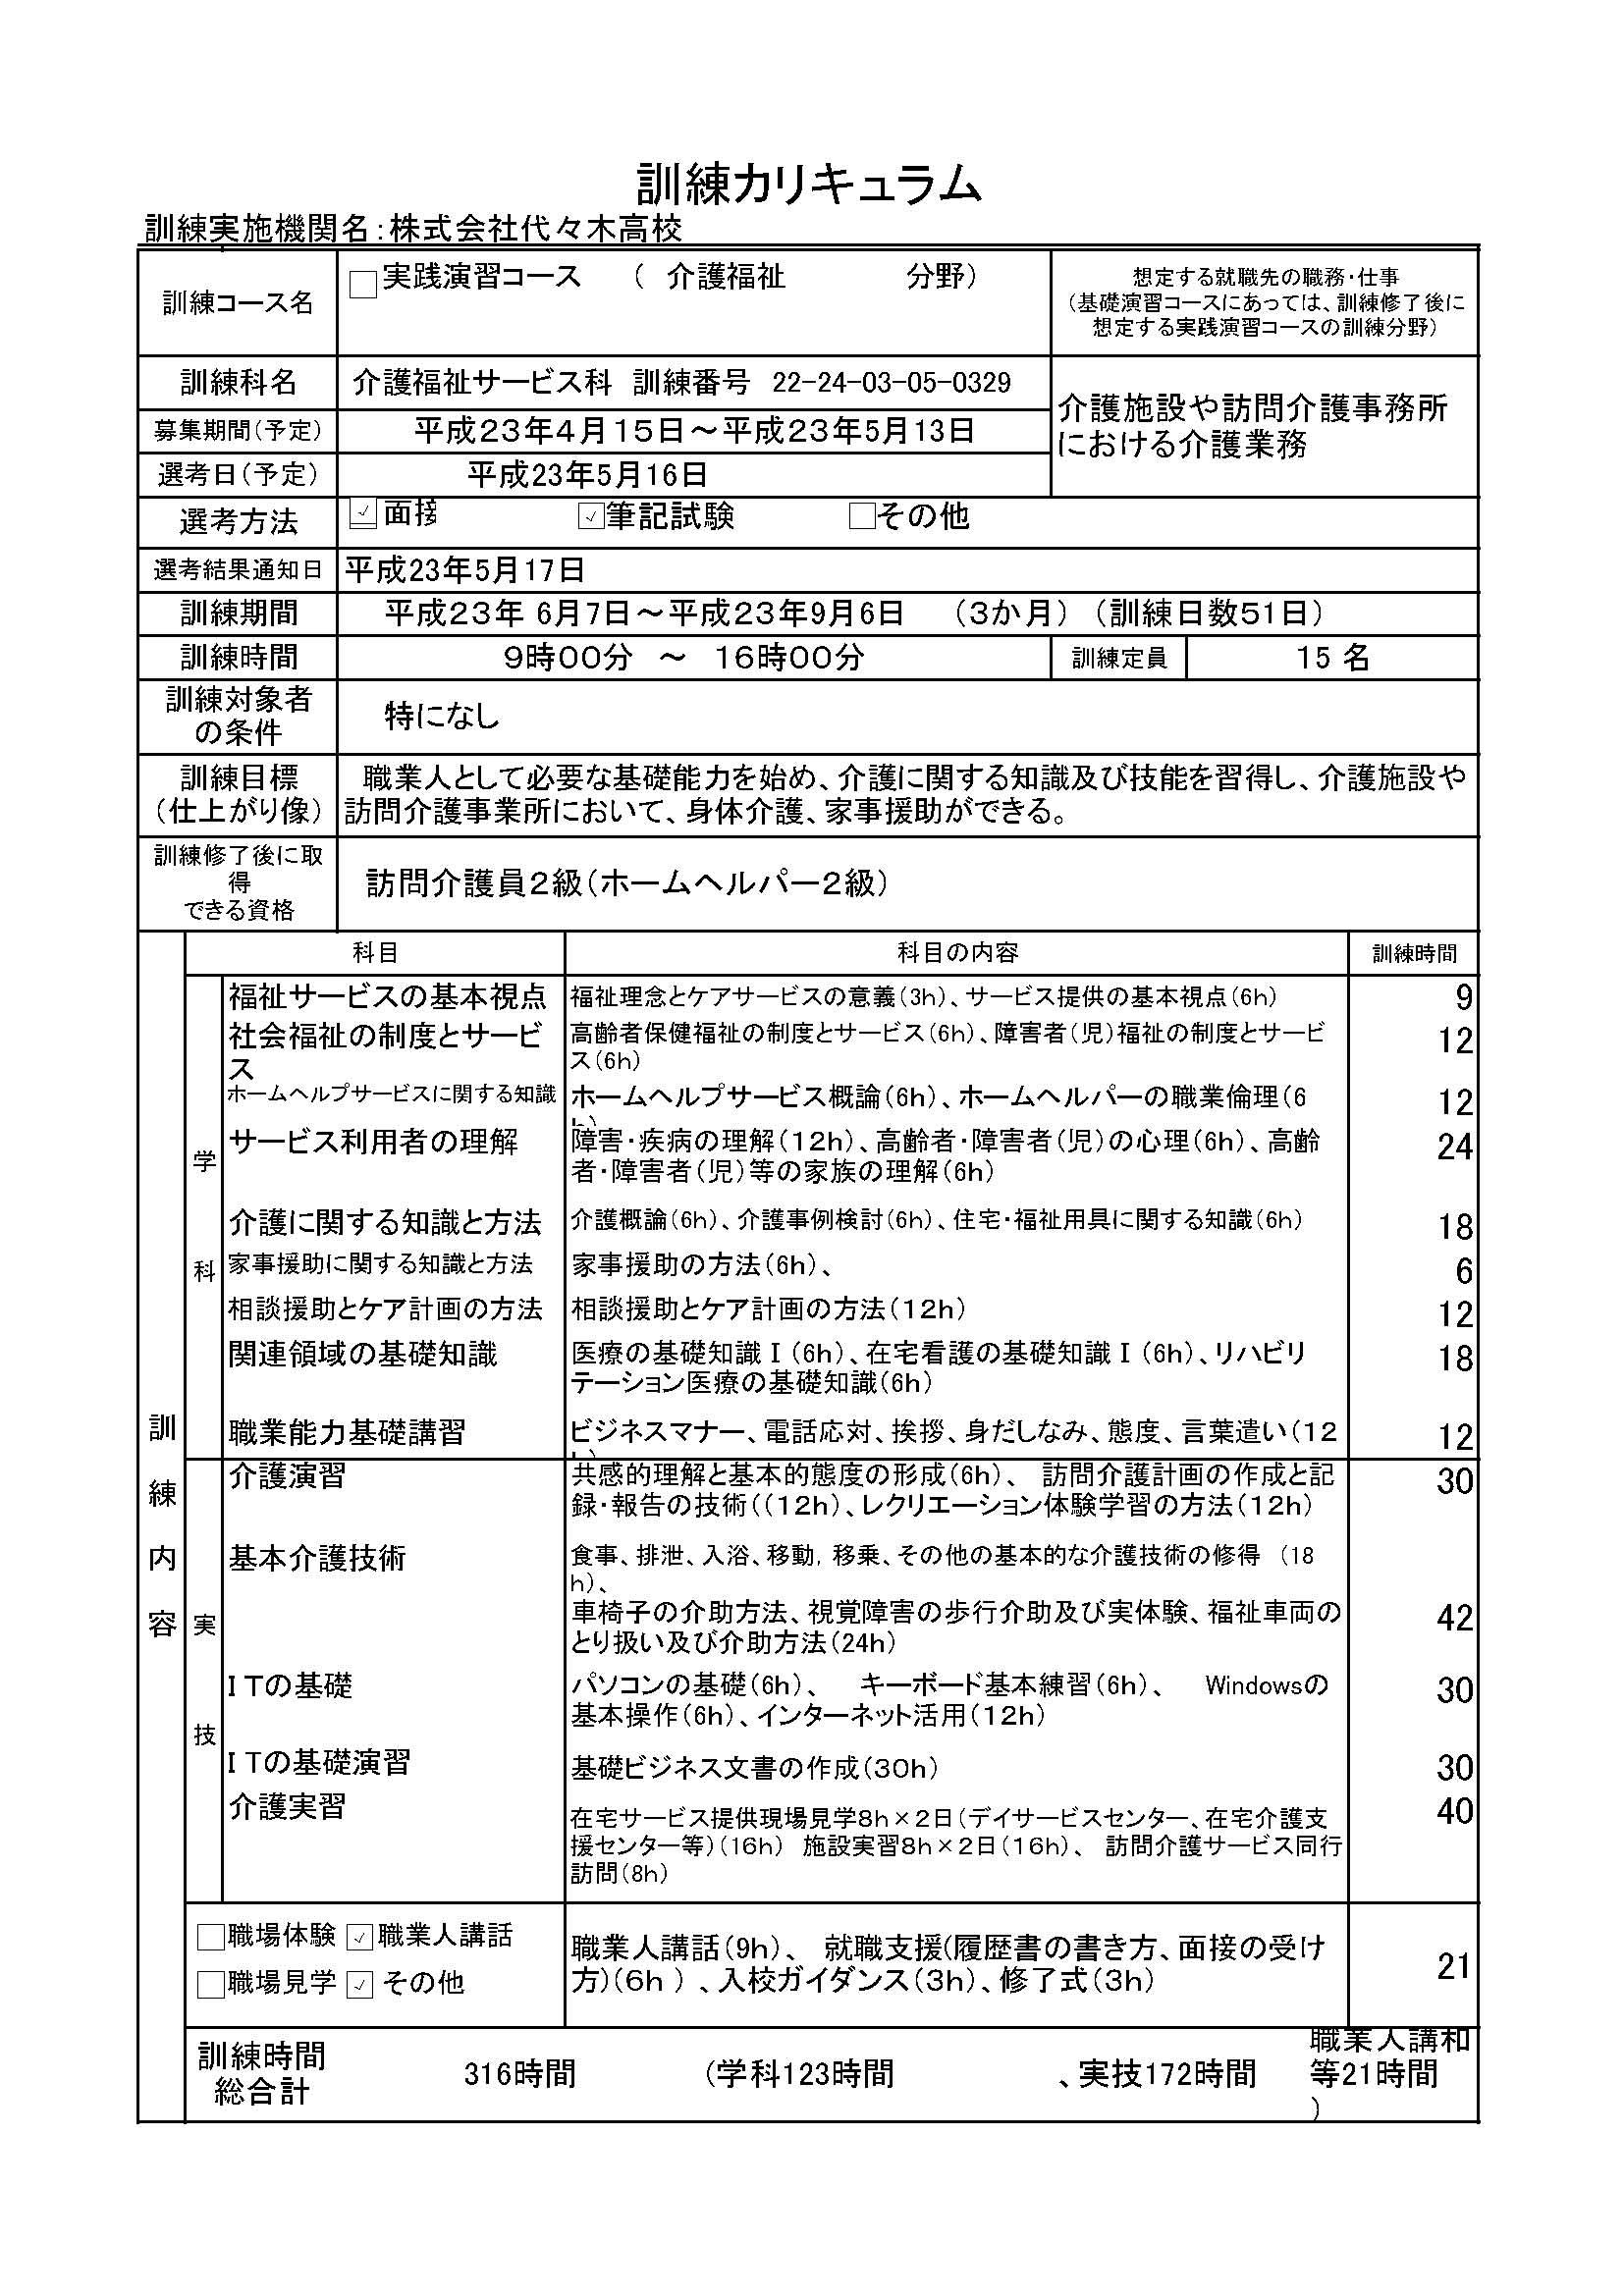 http://iseshima.org/1106%E3%83%9B%E3%83%BC%E3%83%A0%E3%83%98%E3%83%AB%E3%83%91%E3%83%BC%E5%8B%9F%E9%9B%86%E3%83%81%E3%83%A9%E3%82%B7_%E3%83%9A%E3%83%BC%E3%82%B8_2.jpg